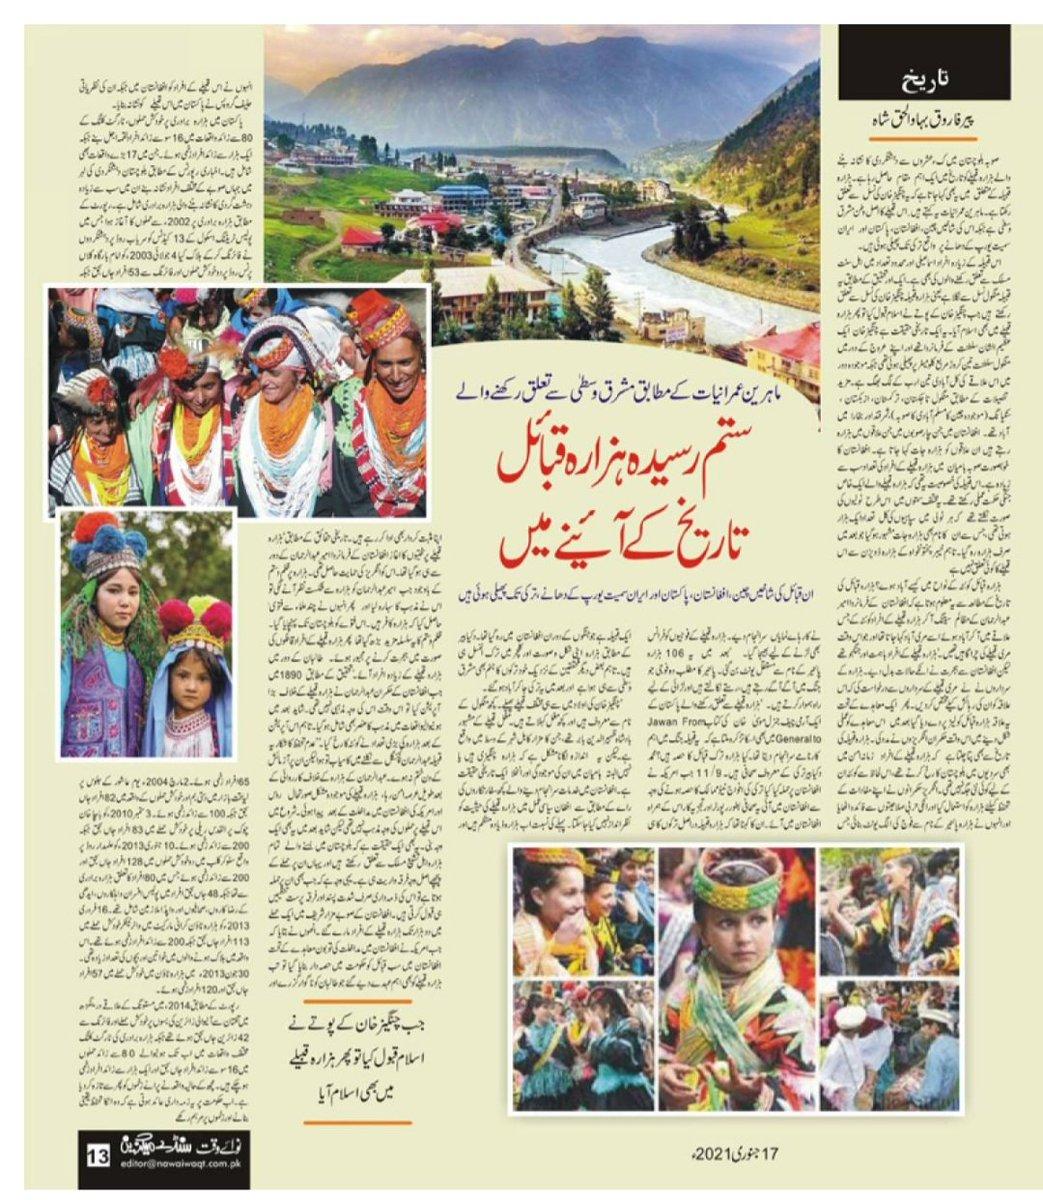 "#HazaraLivesMatter  #هزاره قبائل کی تاریخ،ان پر ہونے والے مظالم کے تزکرہ اور اسباب کے تجزیہ پر مشتمل راقم کا خصوصی مضمون روزنامہ نواے وقت کے سنڈے میگزین میں شائع ہوا""Sunday Magazine   Nawaiwaqt"""